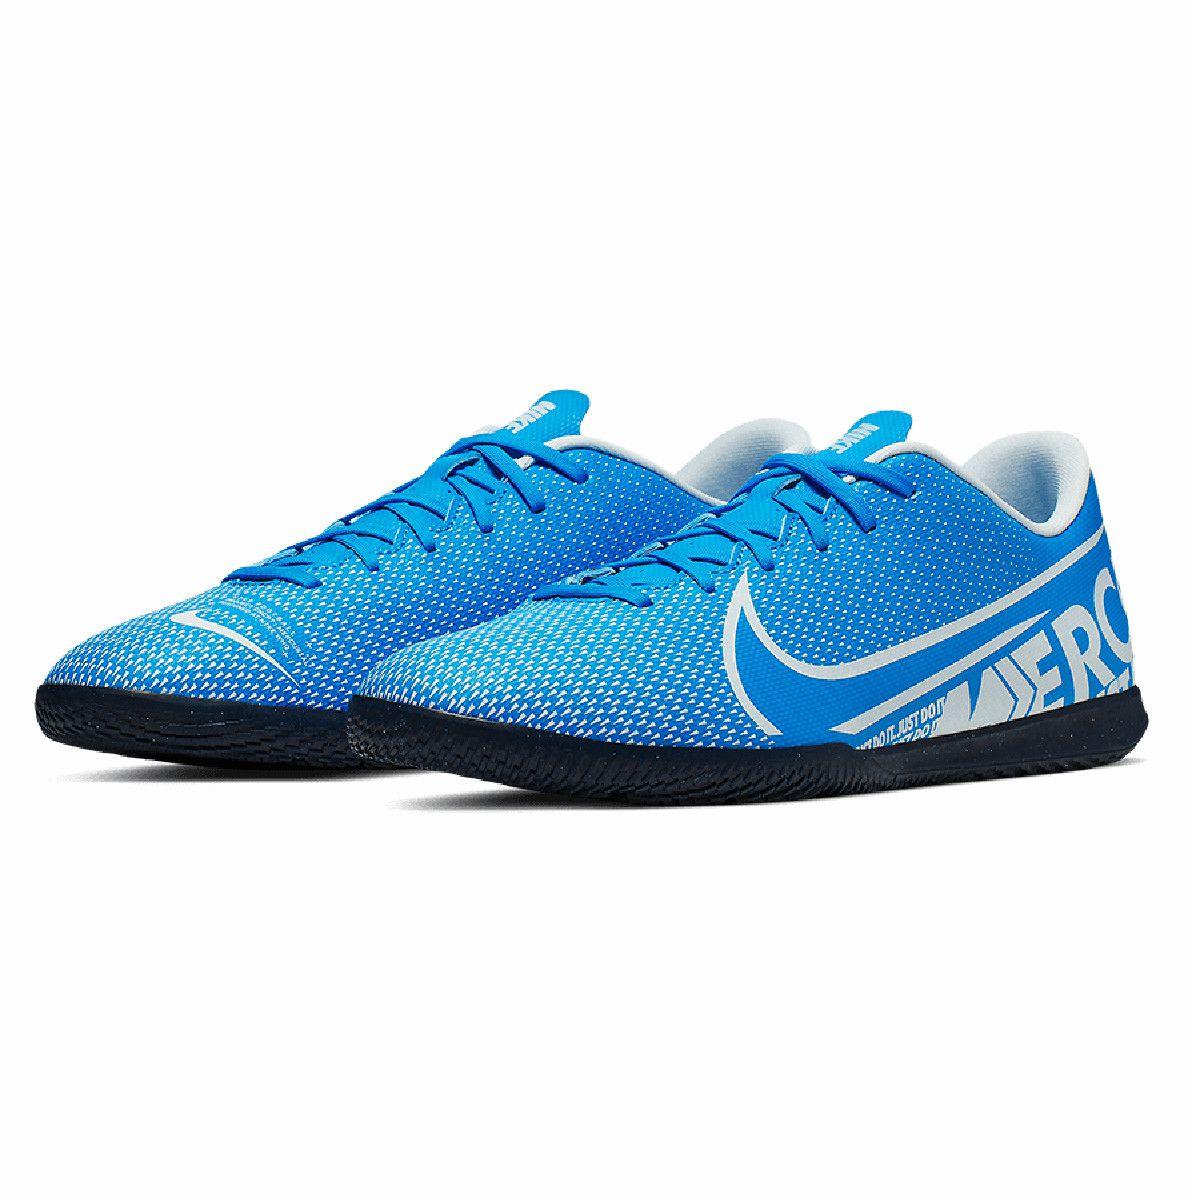 Tenis Nike Mercurial Vapor 13 Club IC Chuteira Futsal AT7997-414